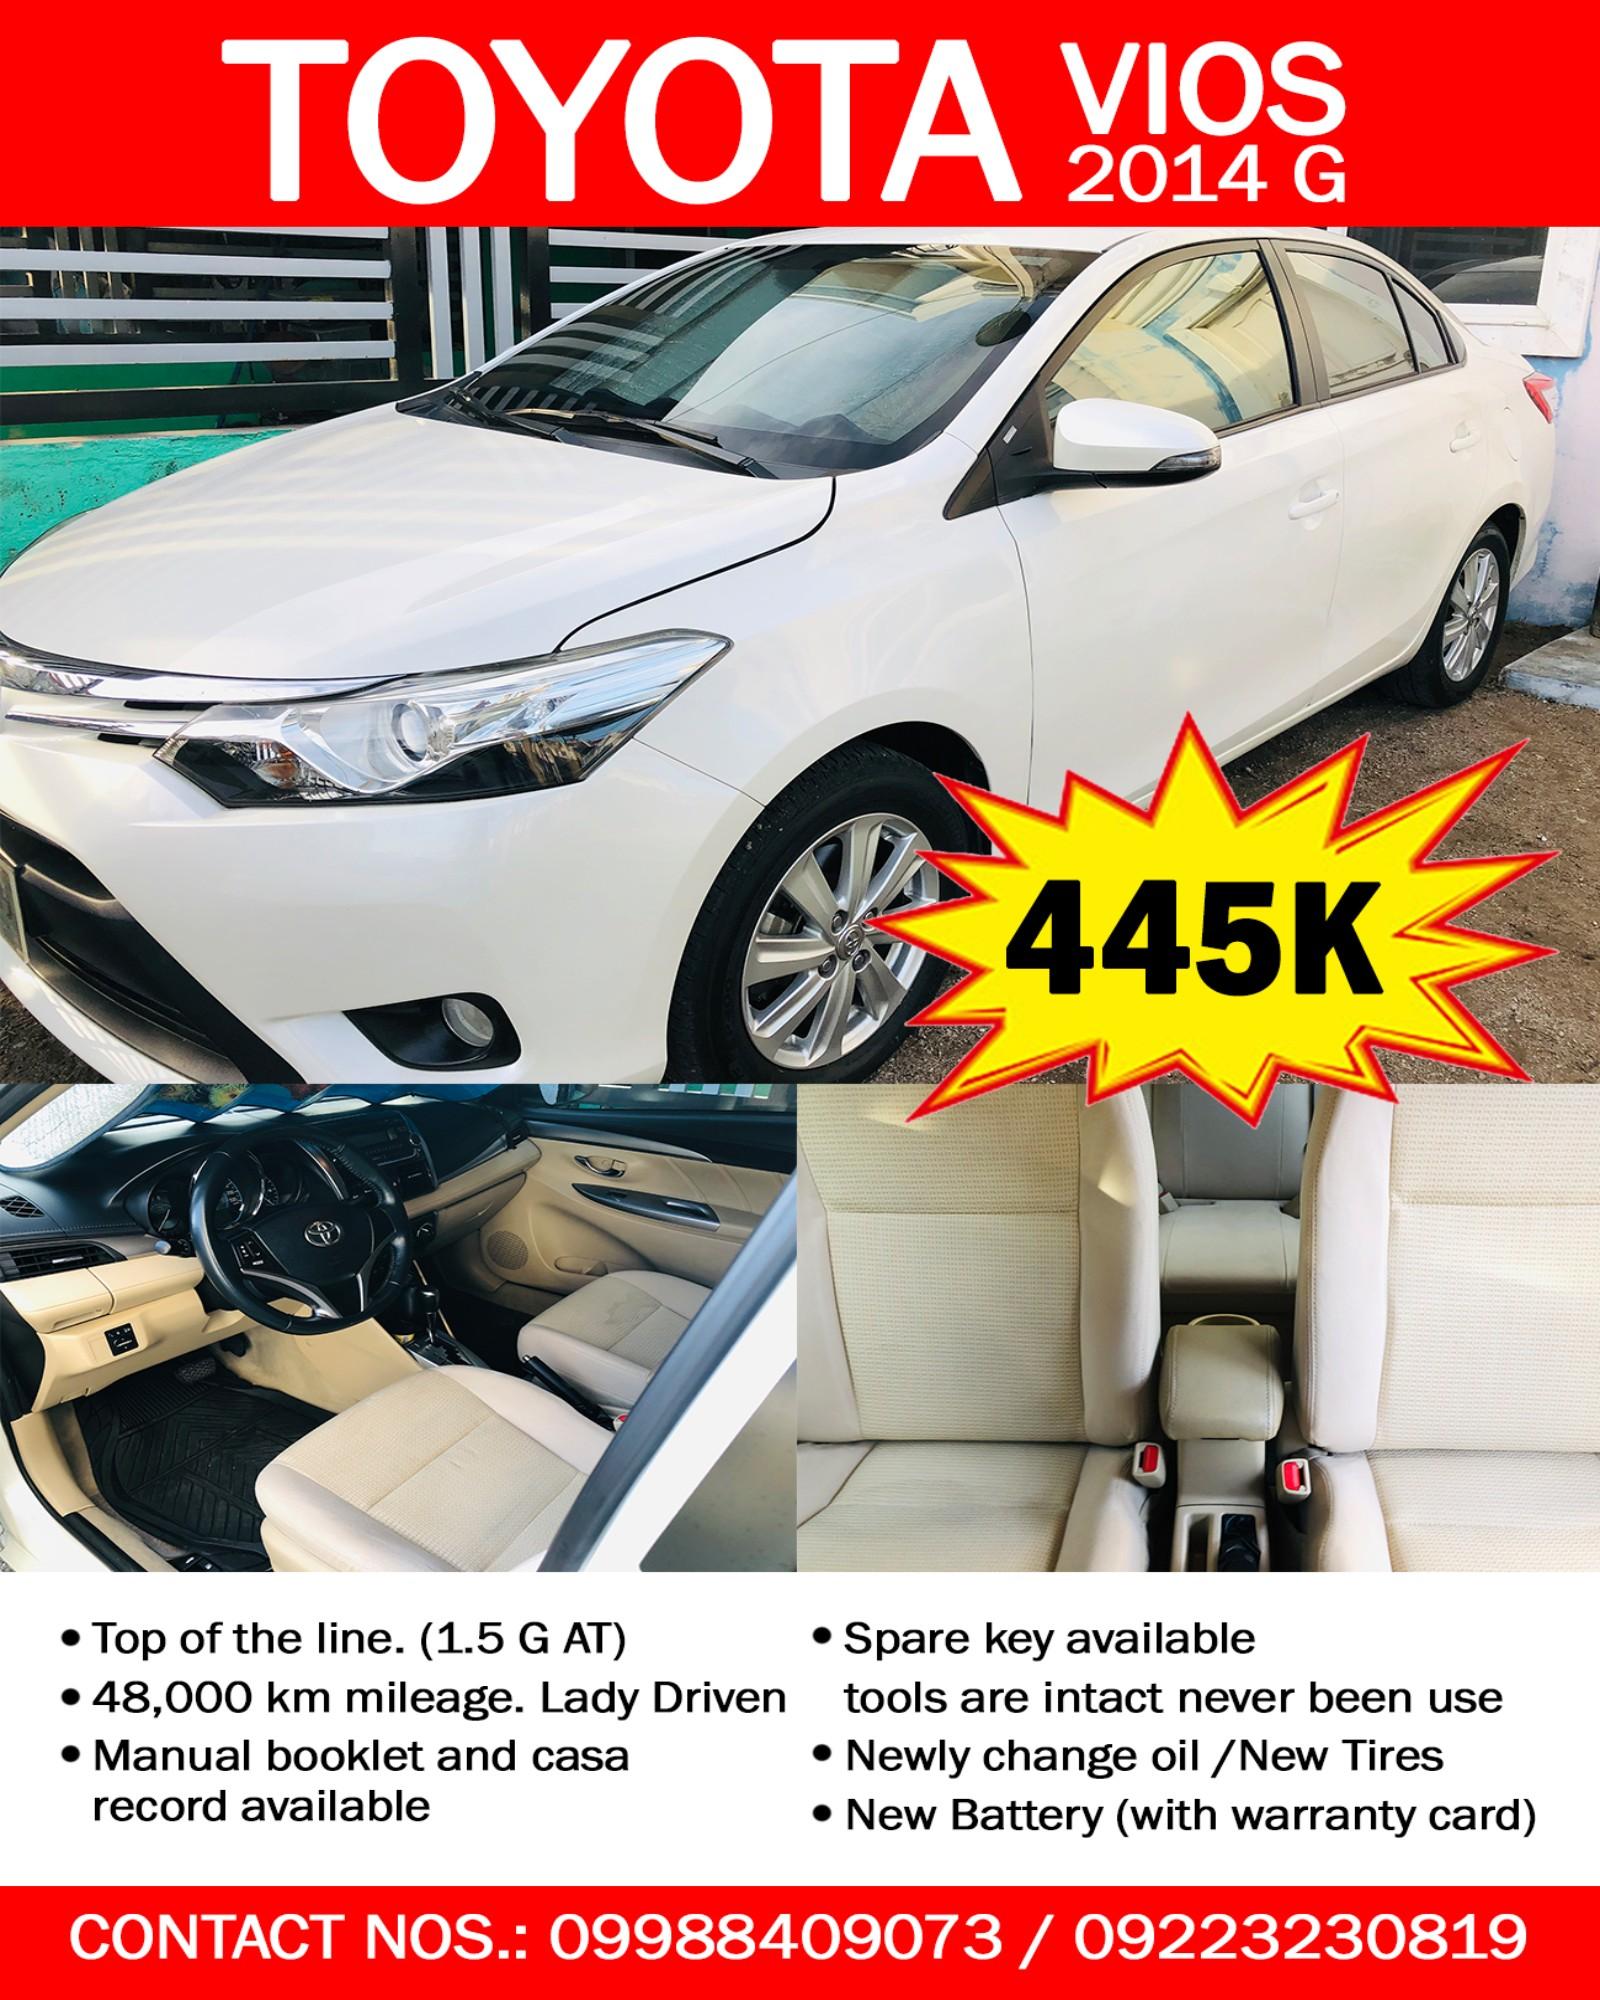 Toyota Vios 2014 G